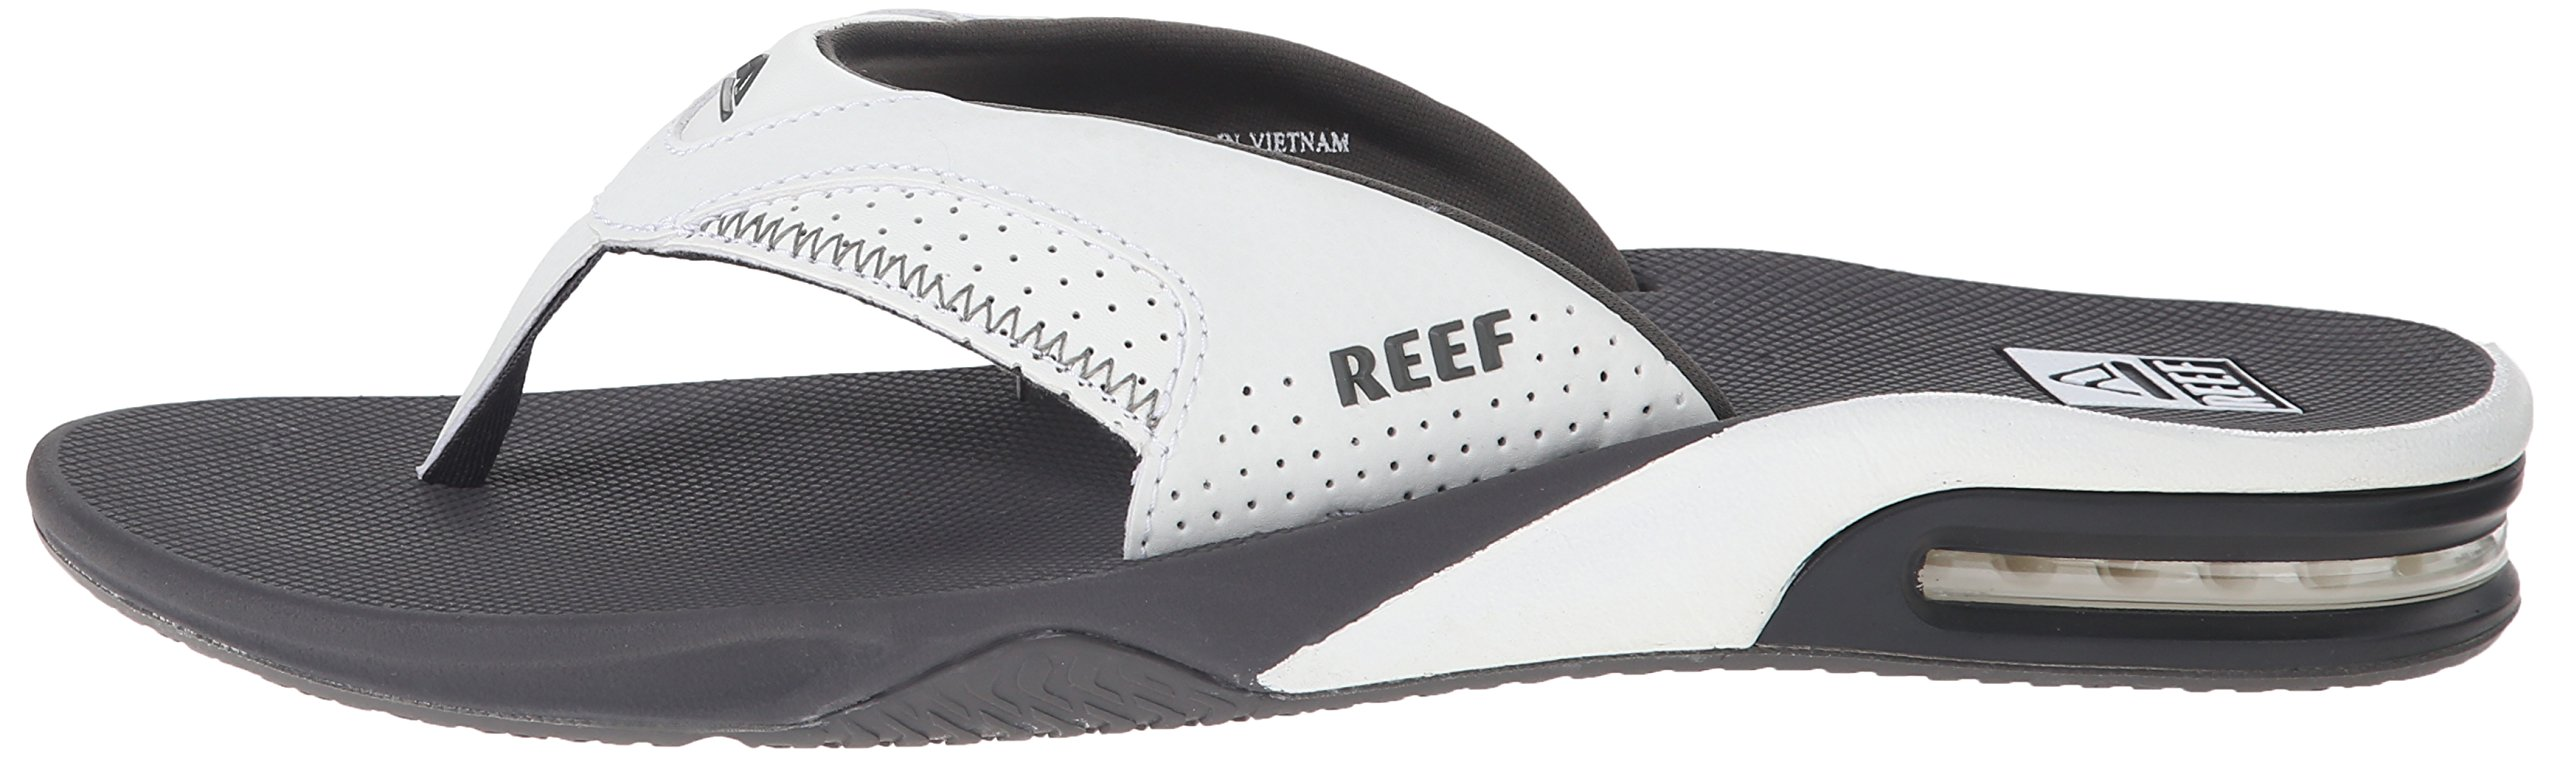 Reef Fanning Mens Sandals  Bottle Opener Flip Flops For Men,GREY/WHITE,7 M US by Reef (Image #5)